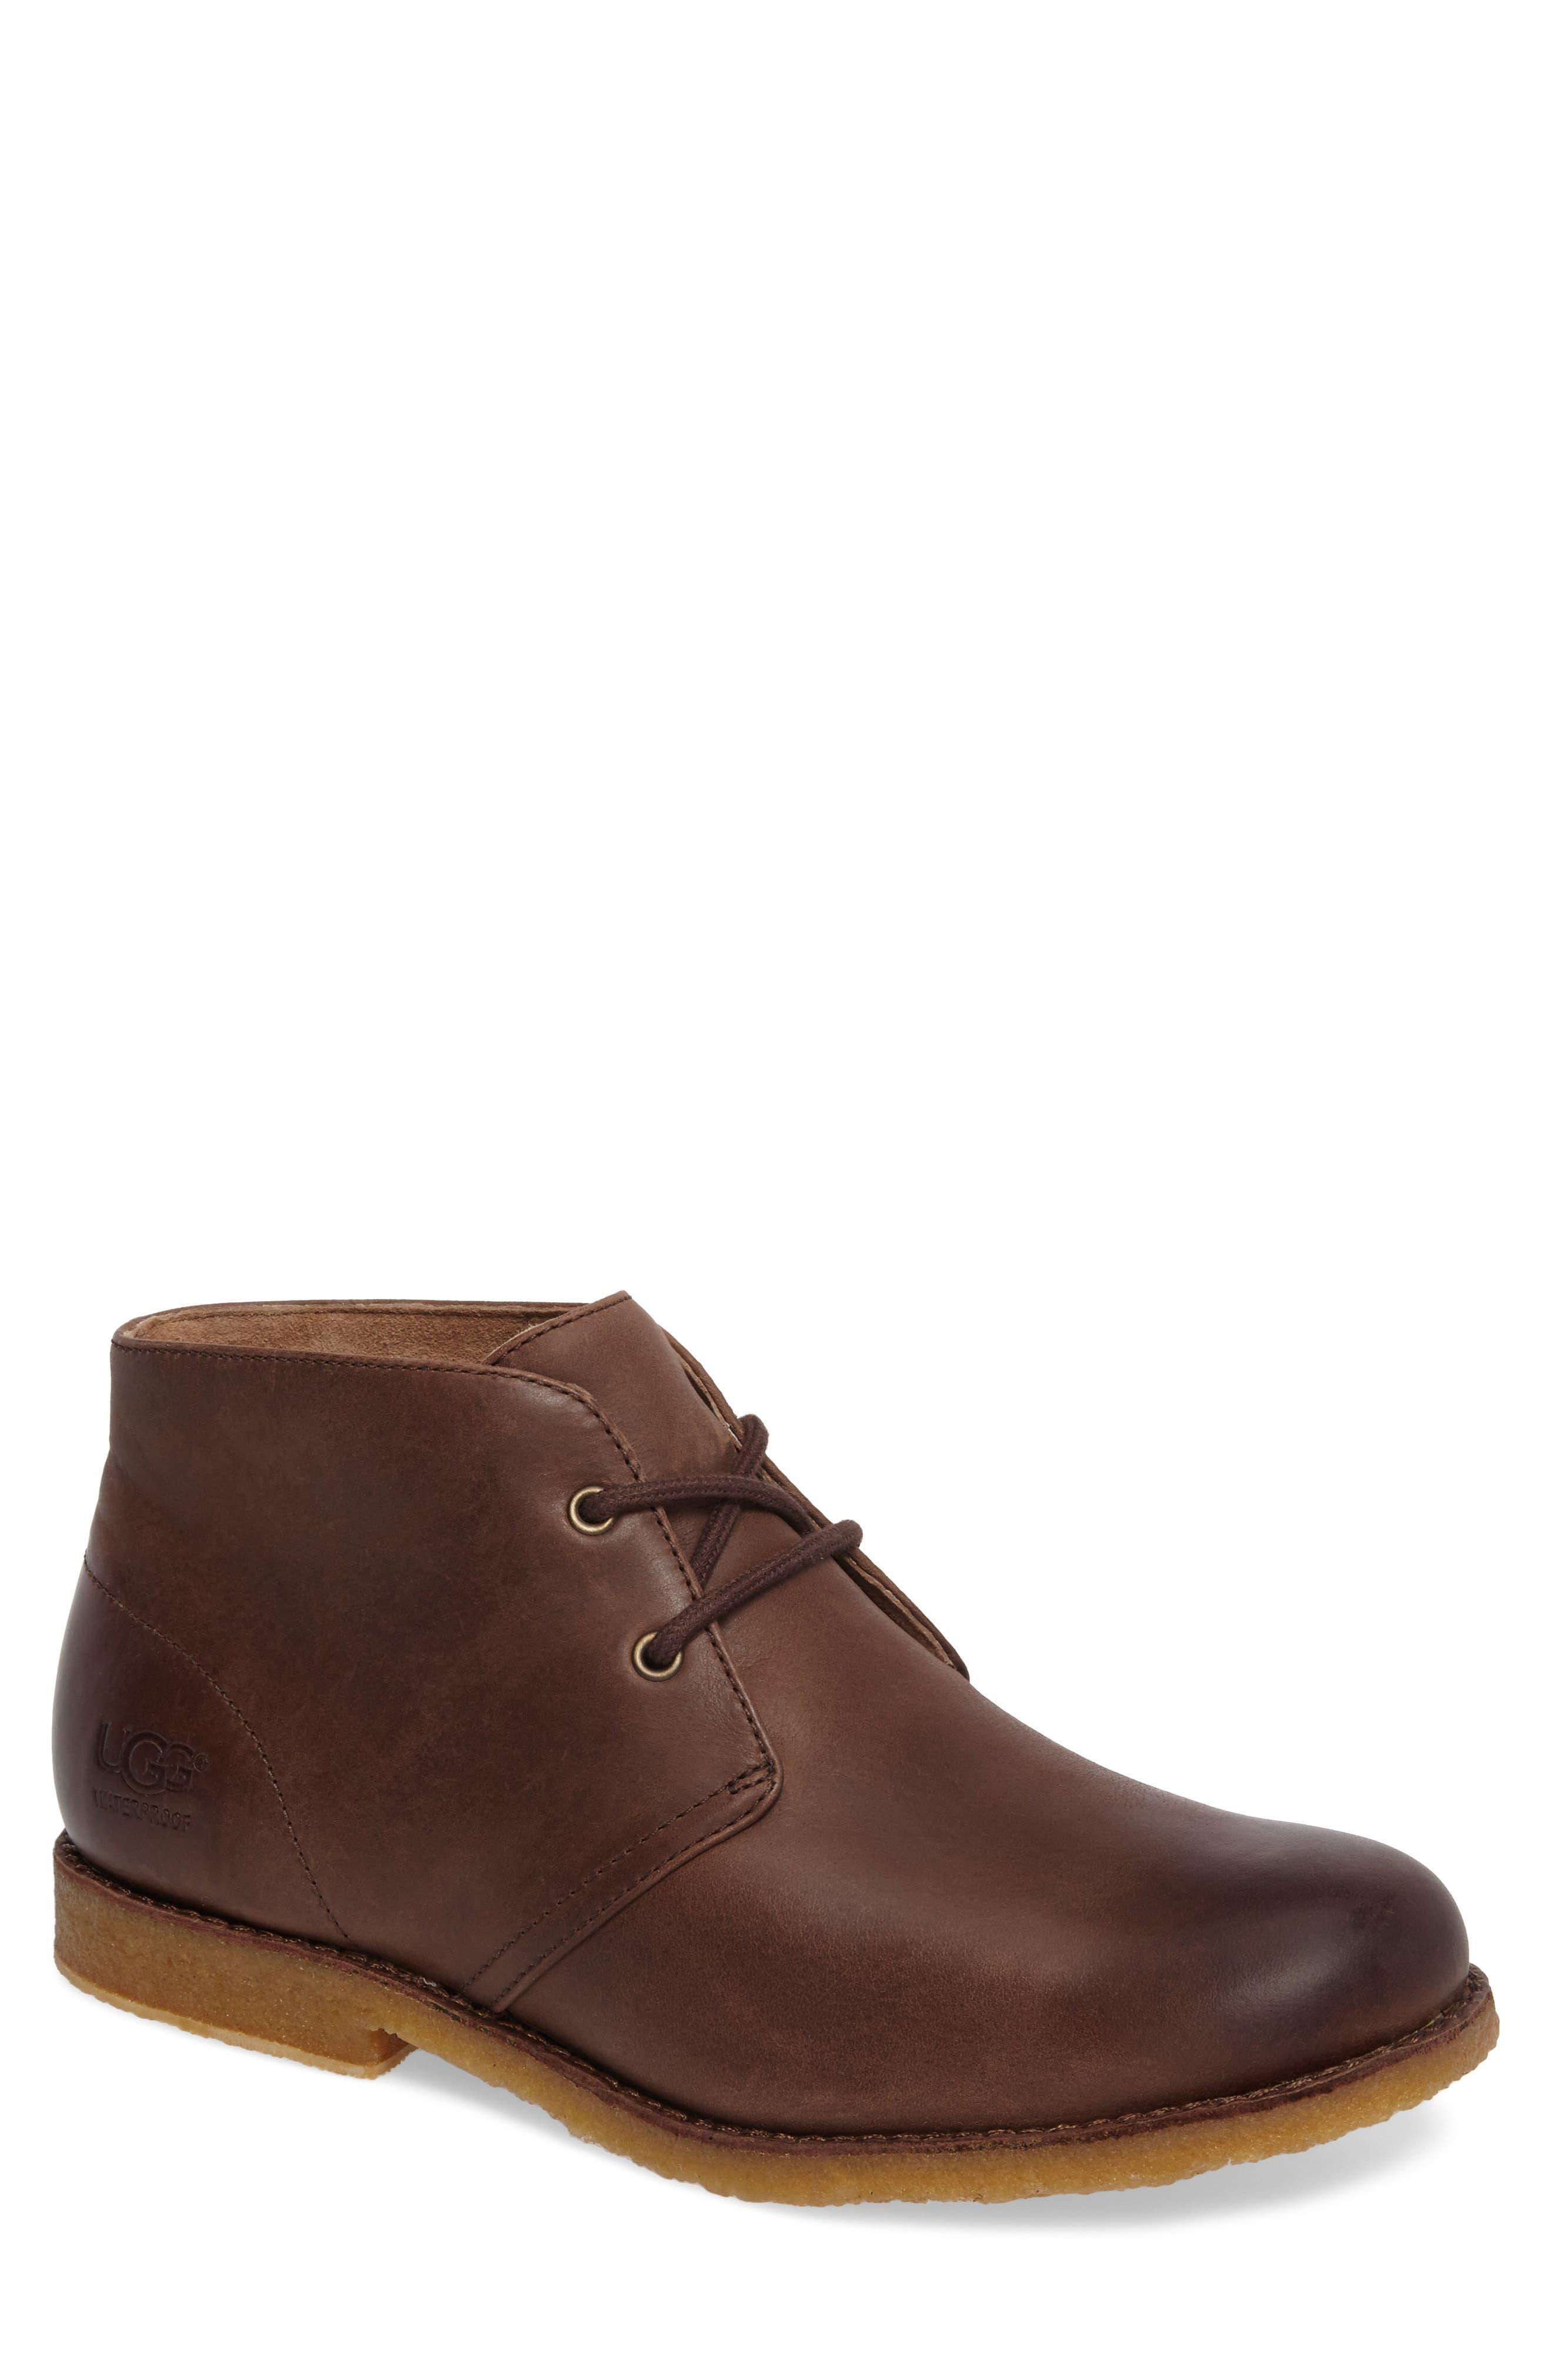 Main Image - UGG® Leighton Chukka Boot (Men)